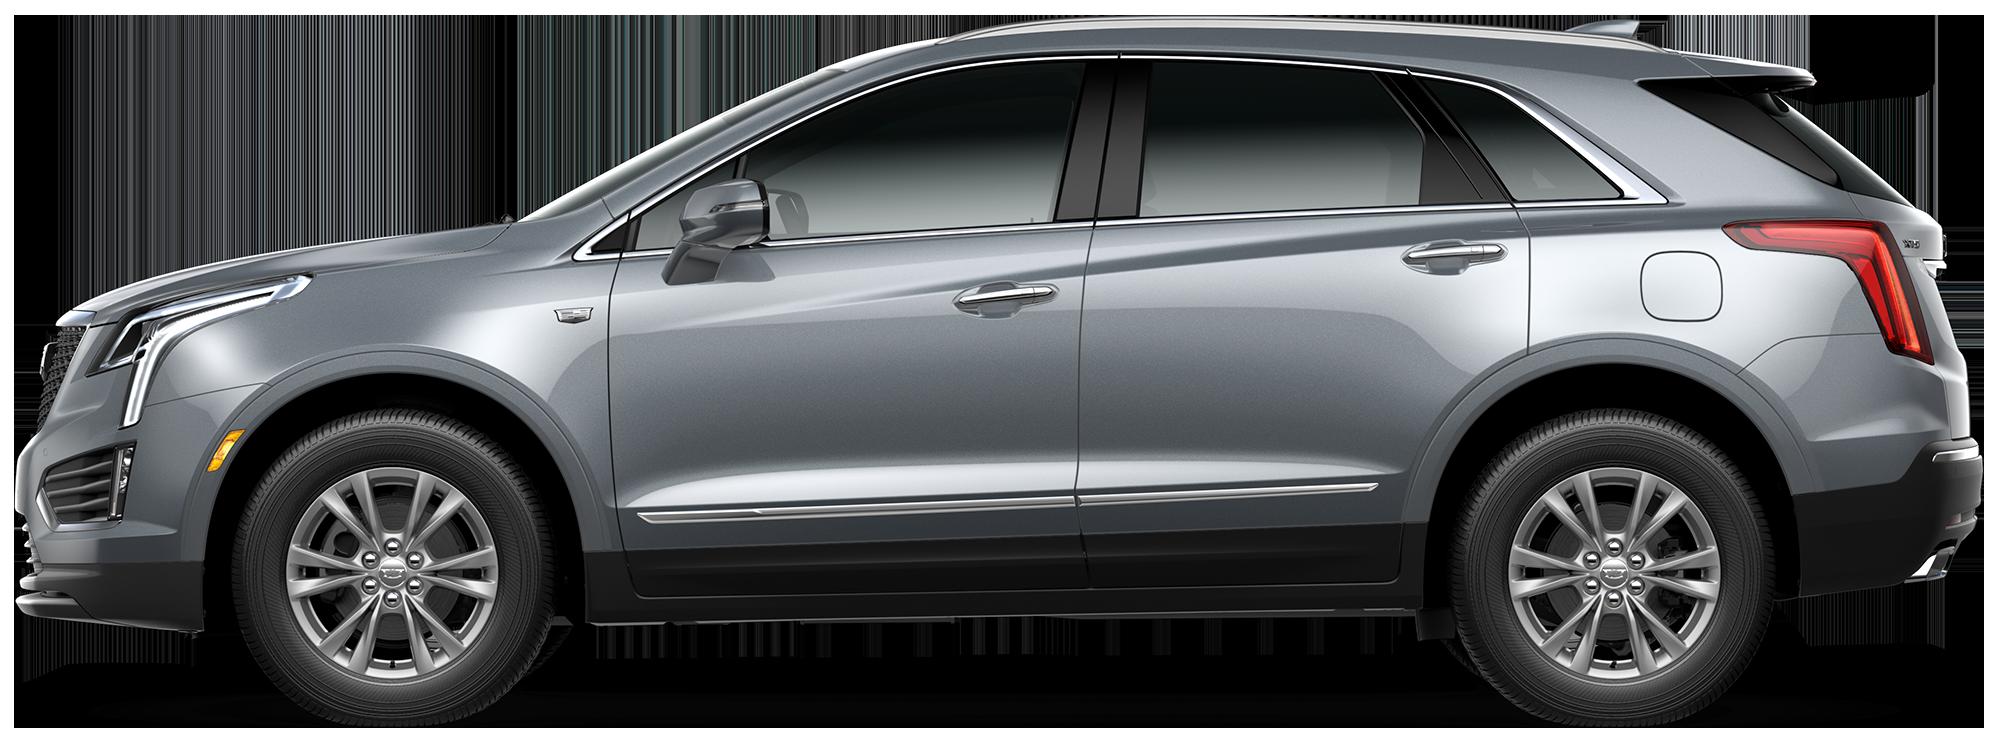 2022 CADILLAC XT5 SUV Luxury